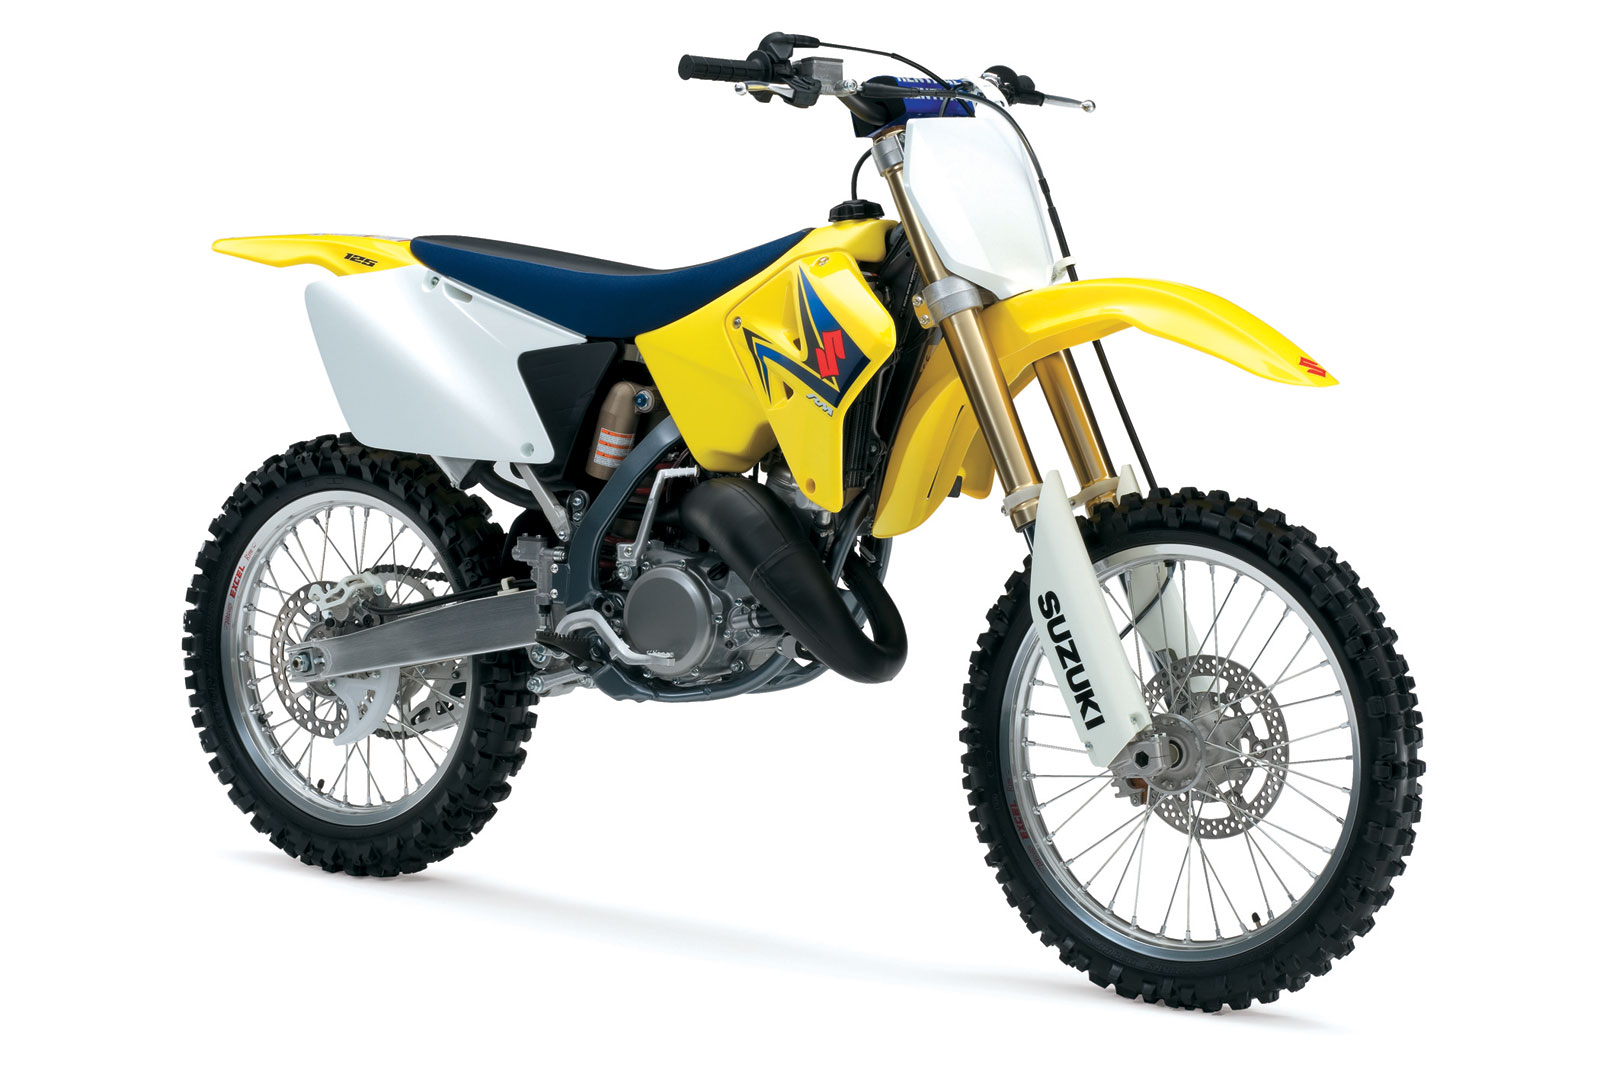 Yamaha Rmx Specs